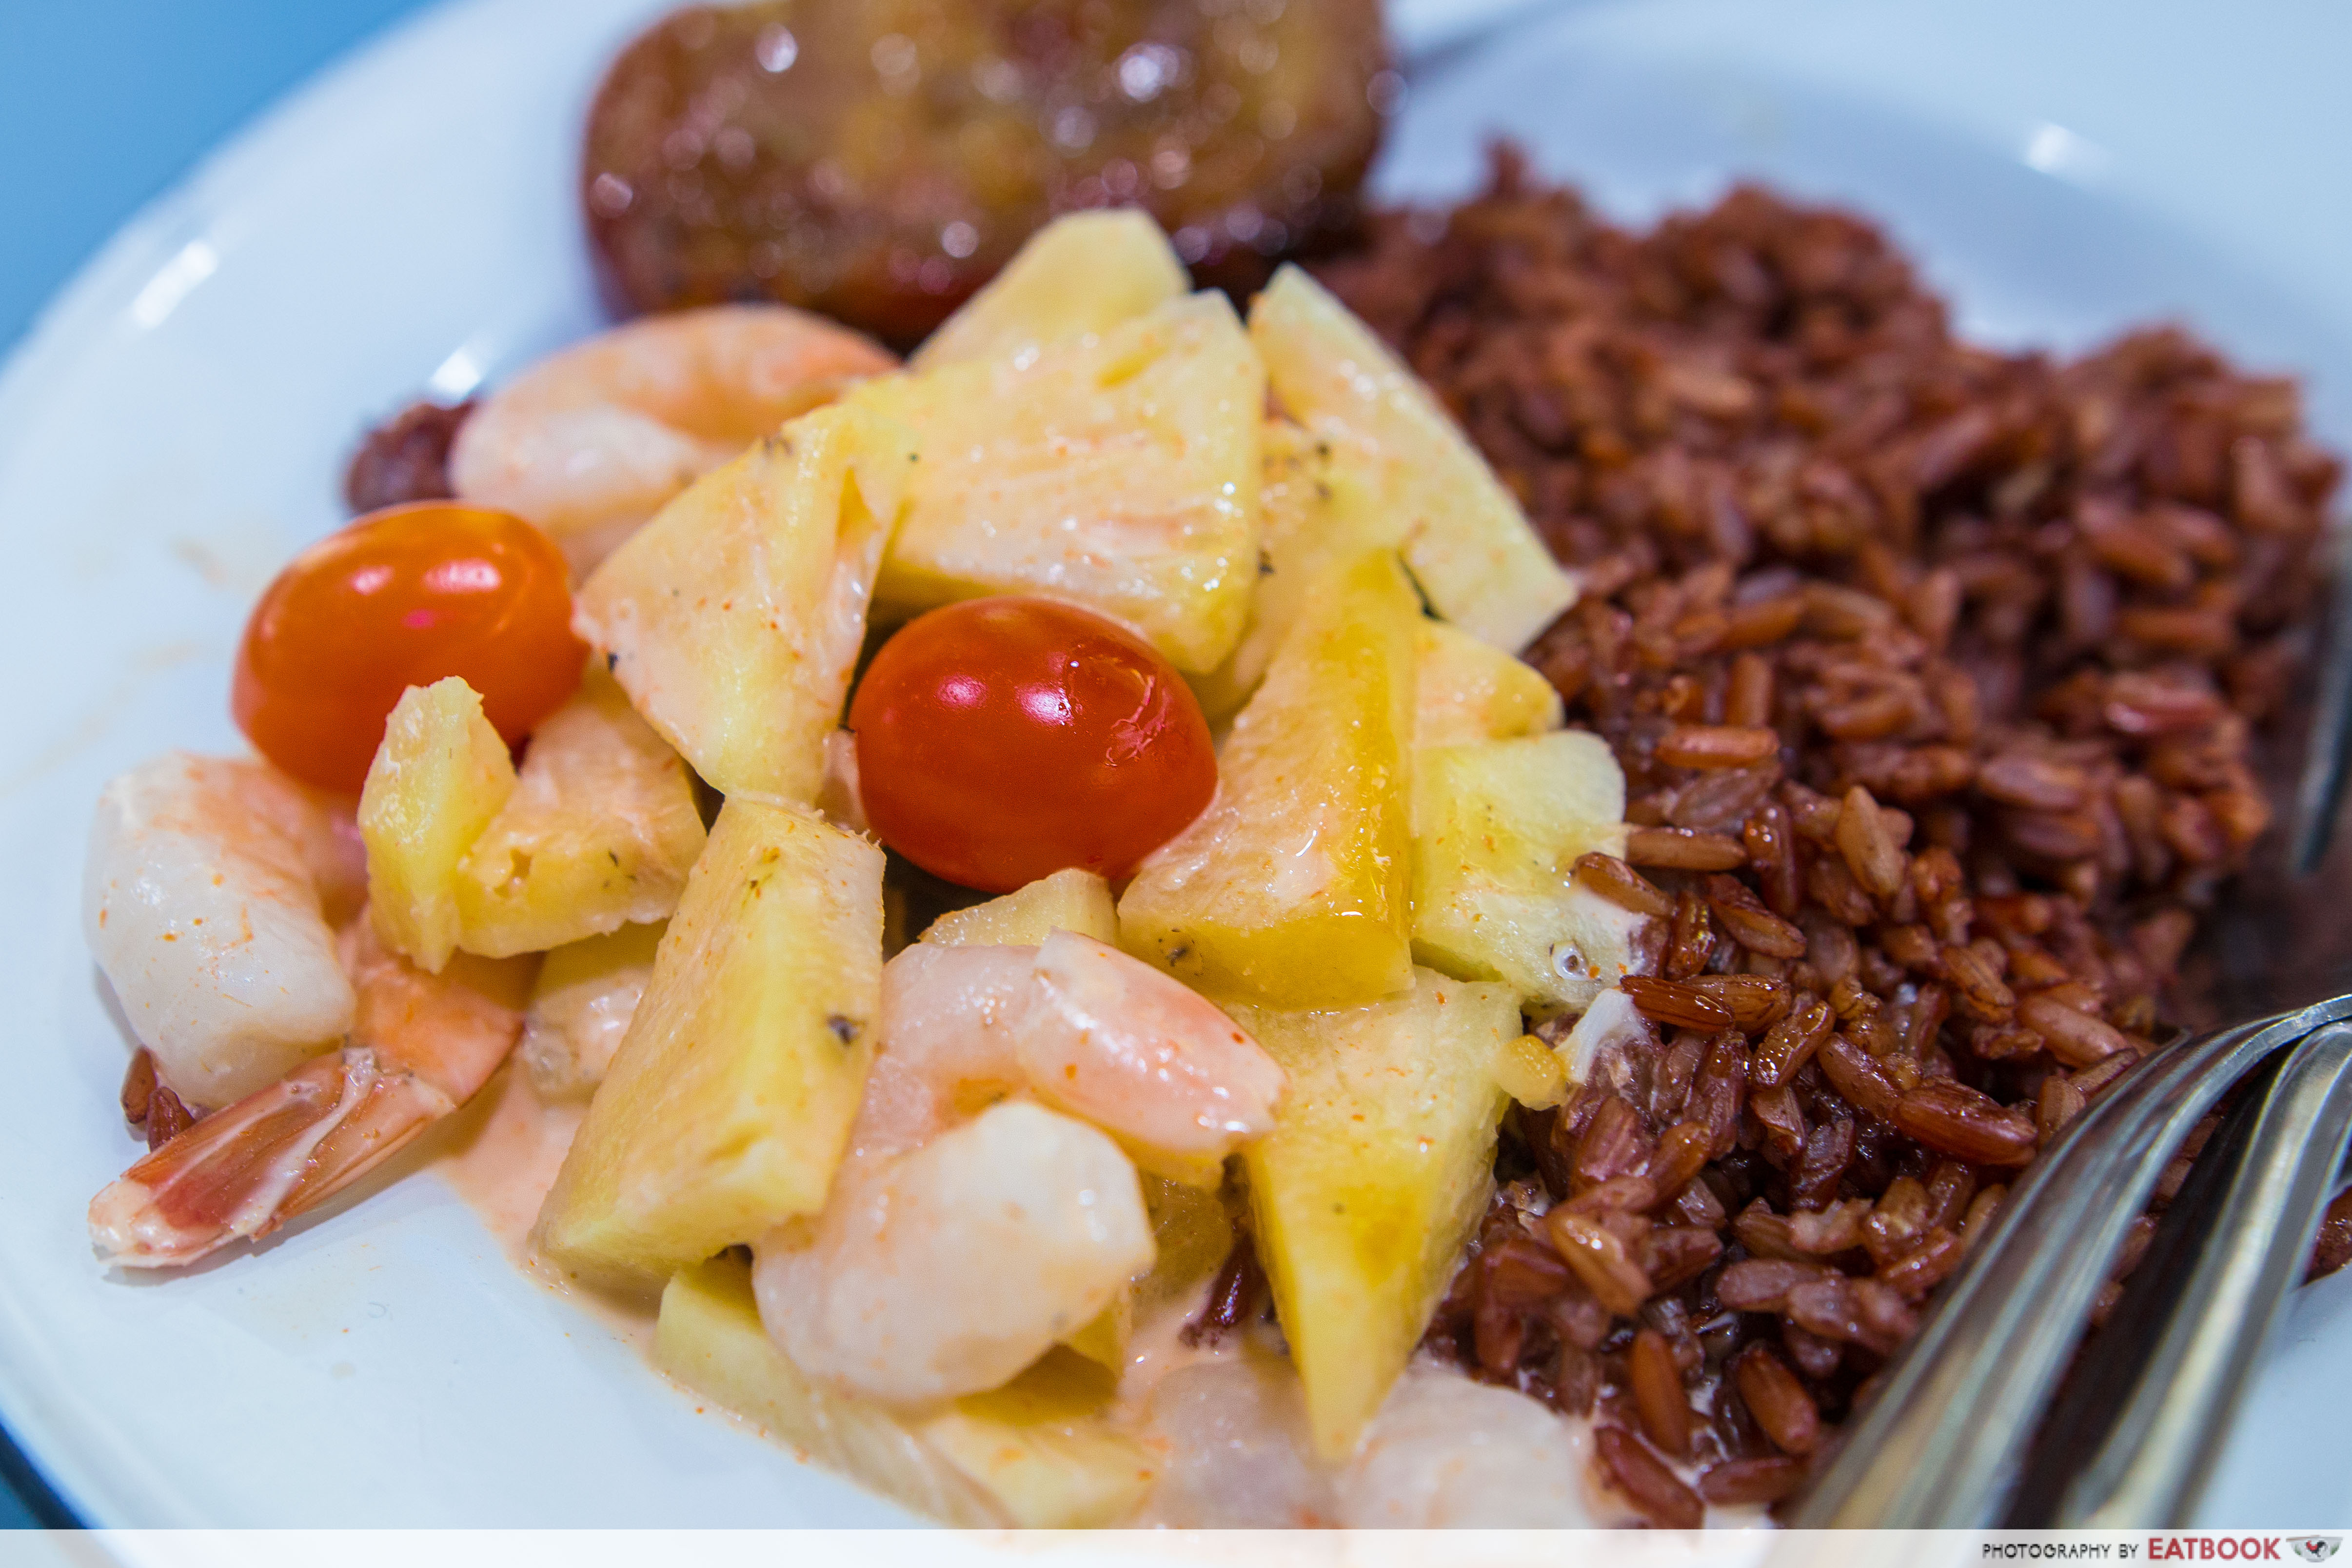 Basil & Mint - Pineapple Prawn Curry